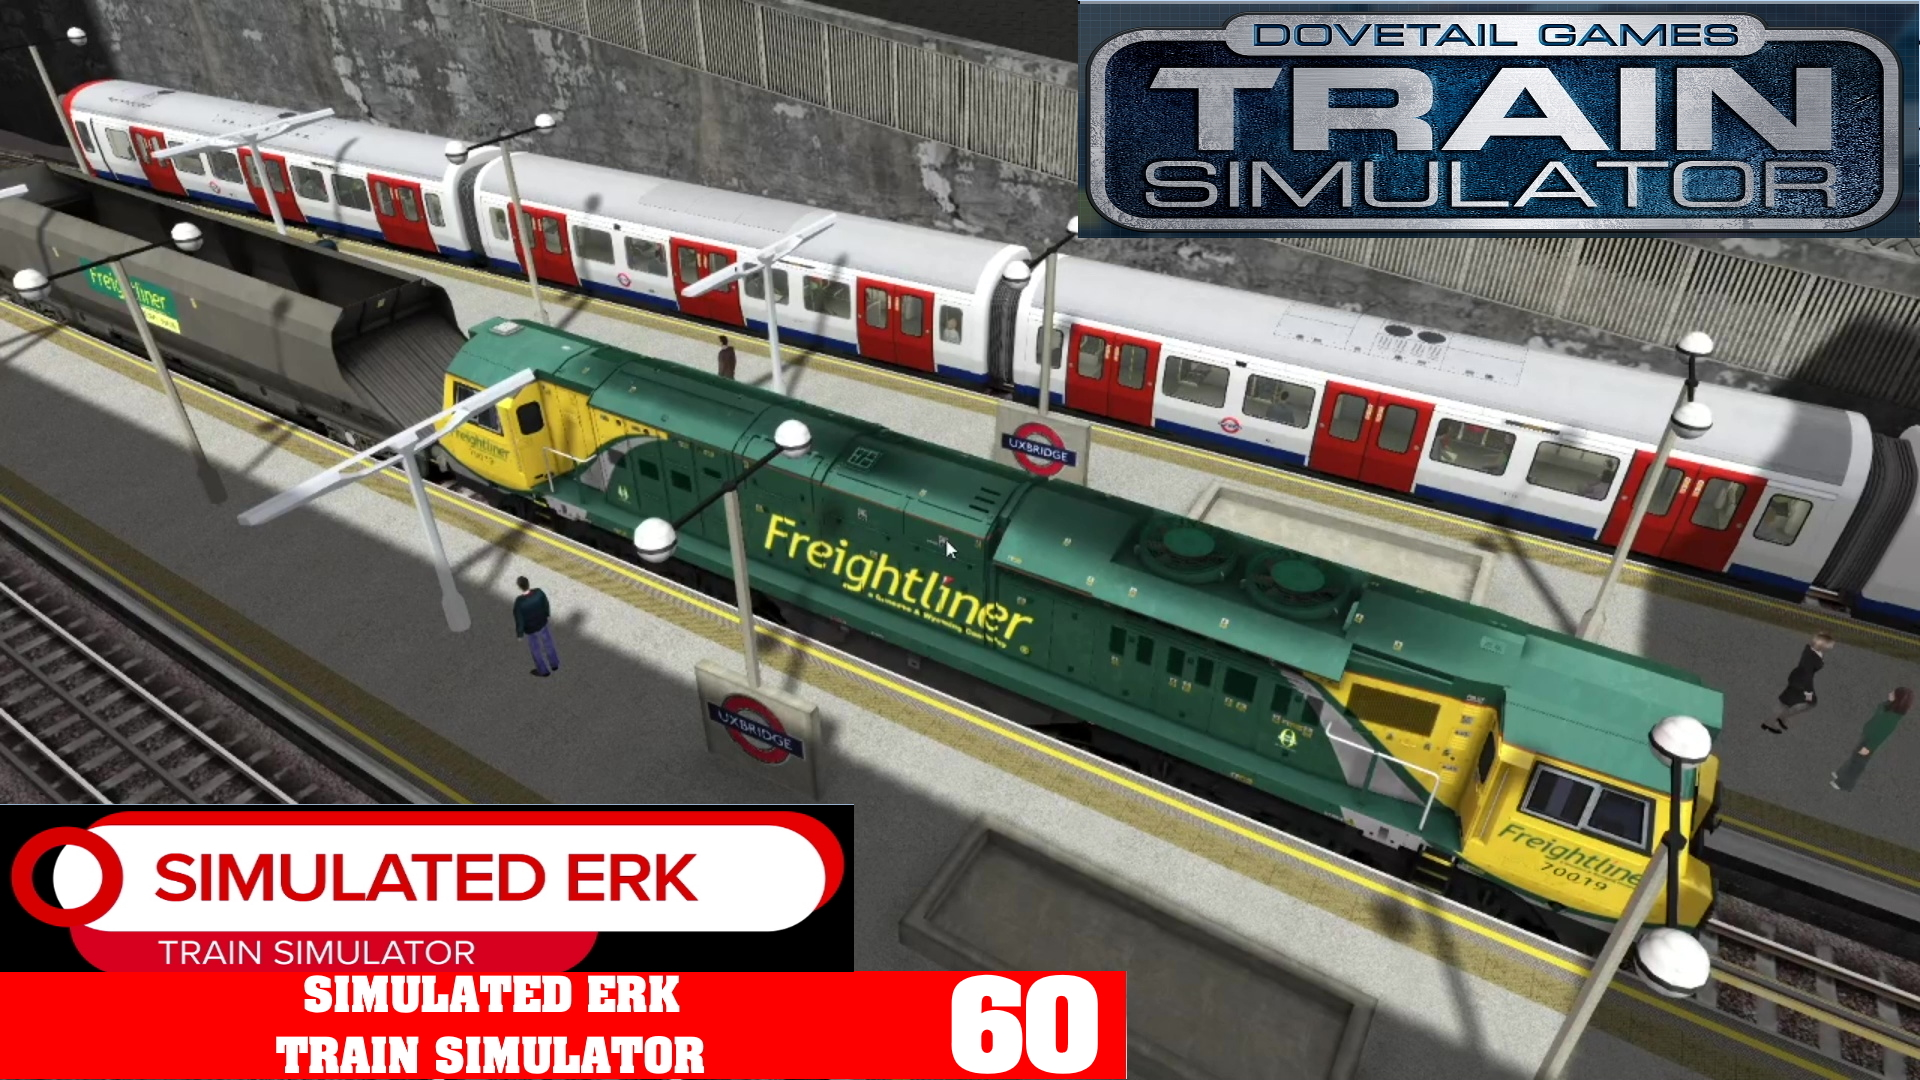 Simulated Erk: Train Simulator episode 60 | London Underground Coal